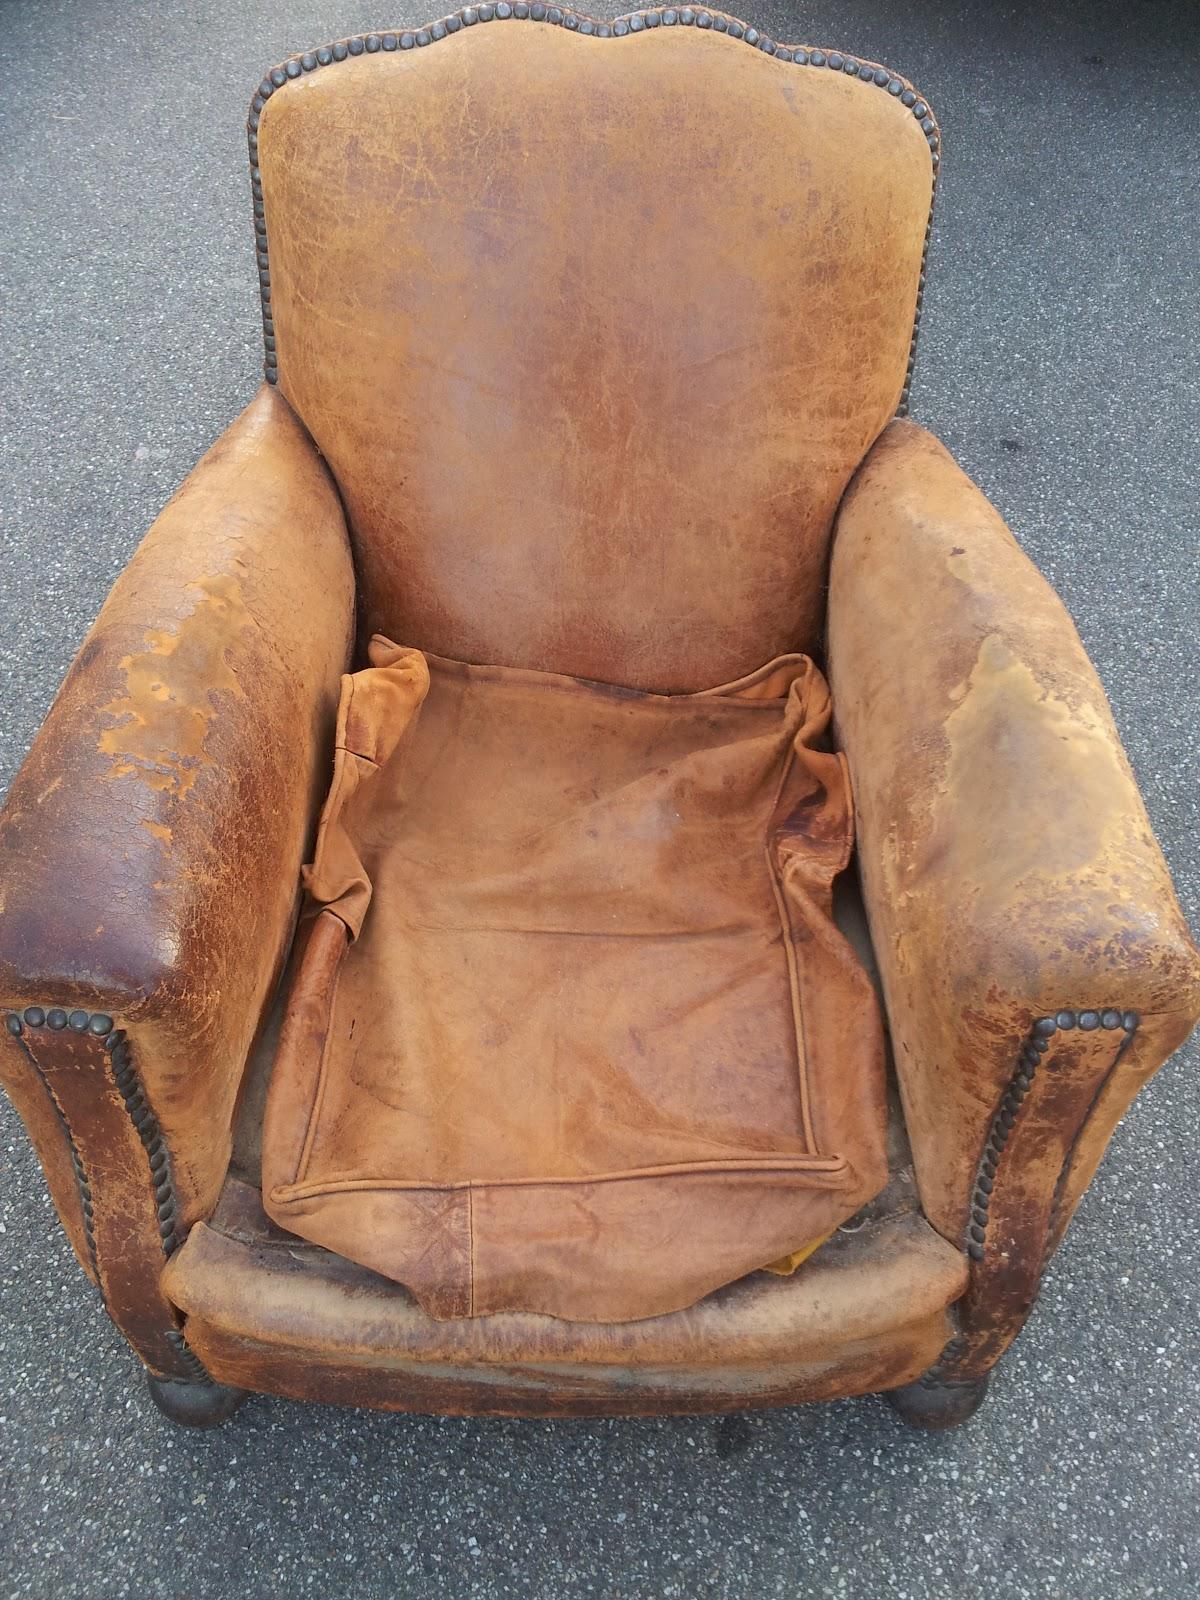 troc and broc fauteuils club a restaurer. Black Bedroom Furniture Sets. Home Design Ideas